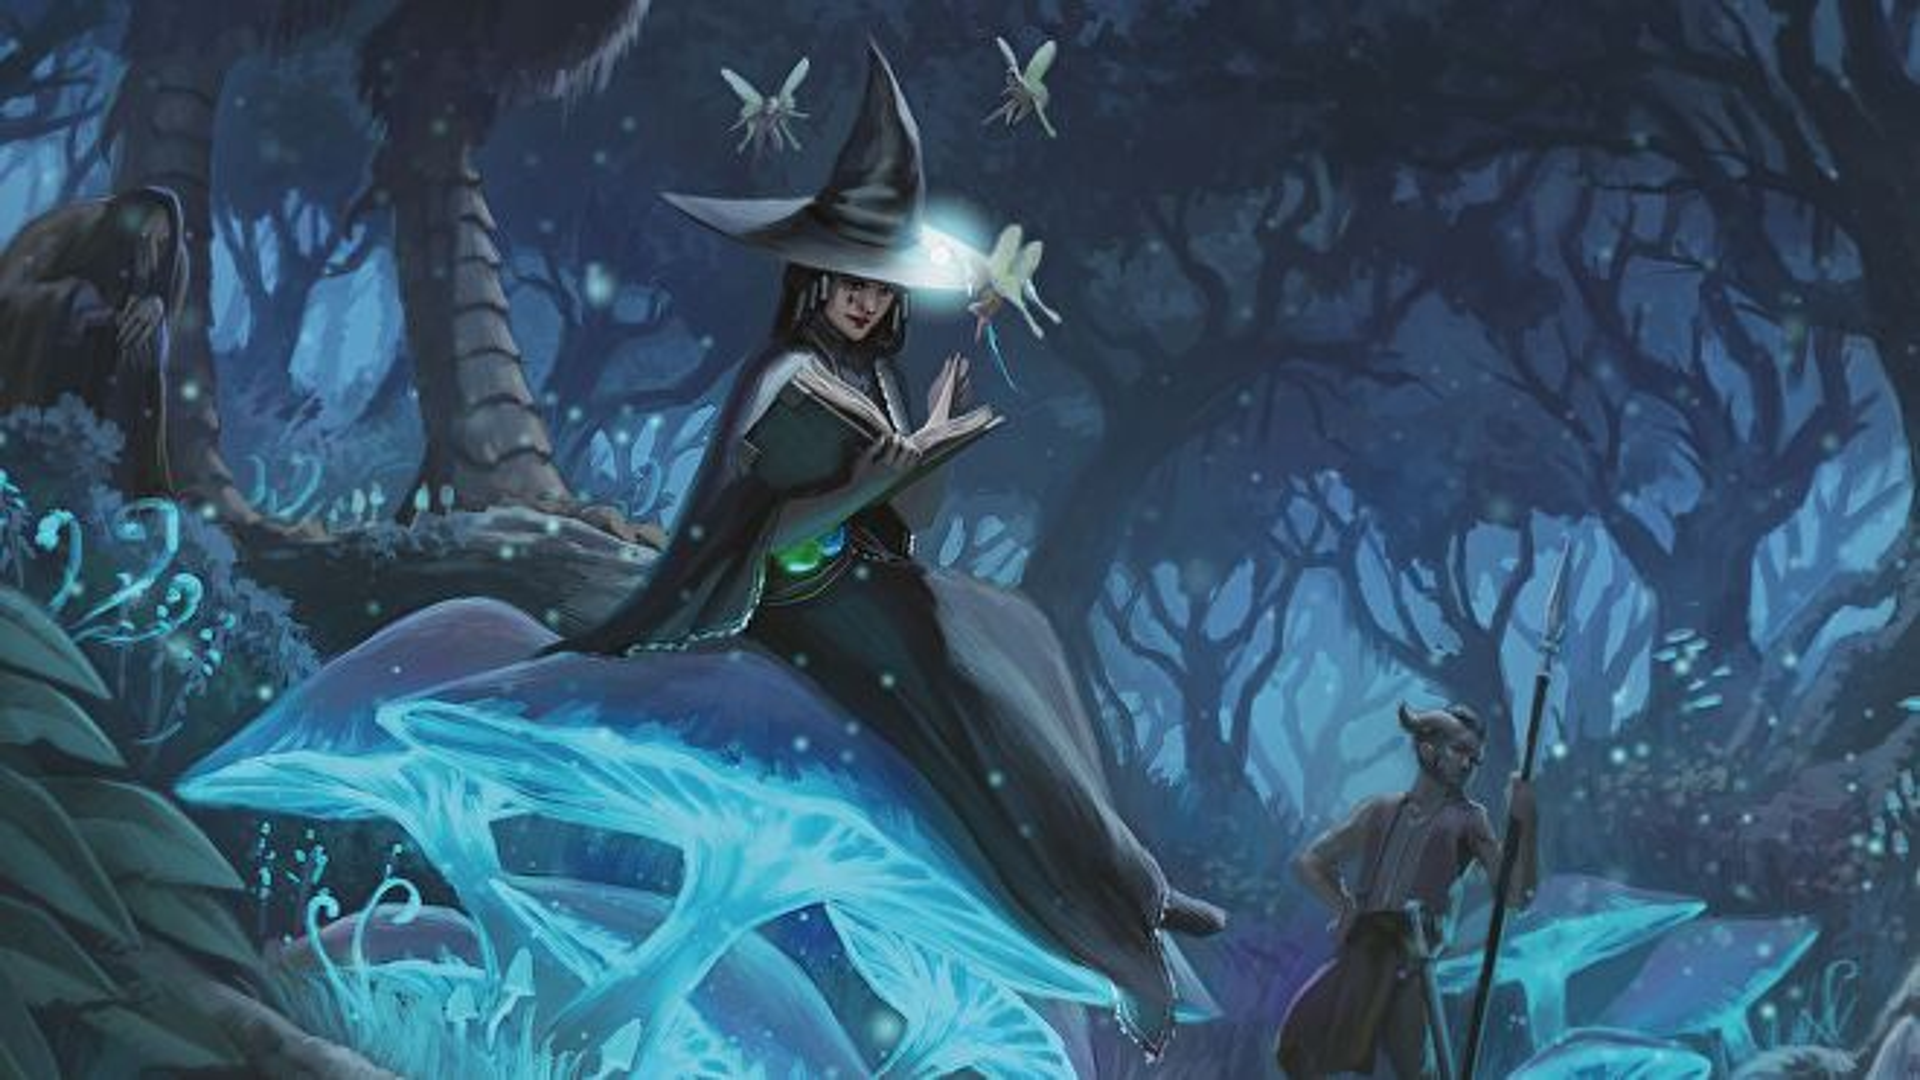 Tasha's Cauldron of Everything D&D RPG artwork 2